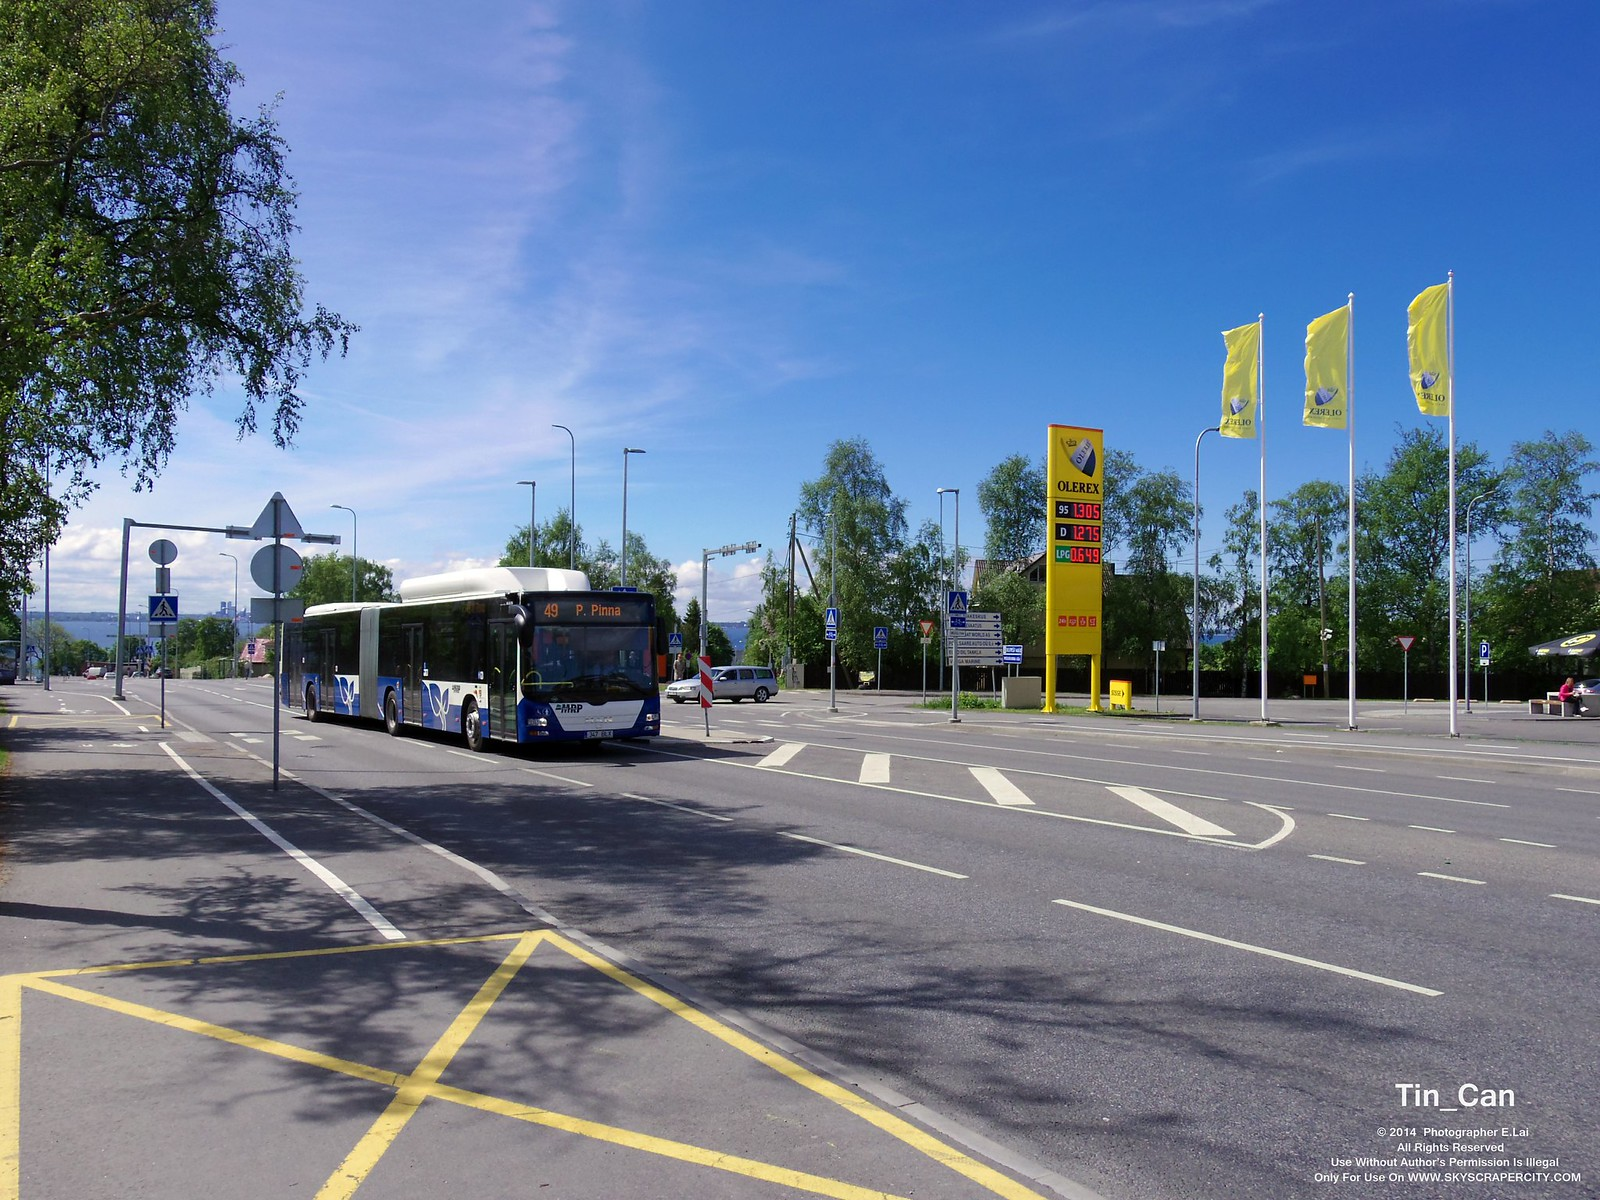 TALLINN | Public Transport - Page 2 - SkyscraperCity